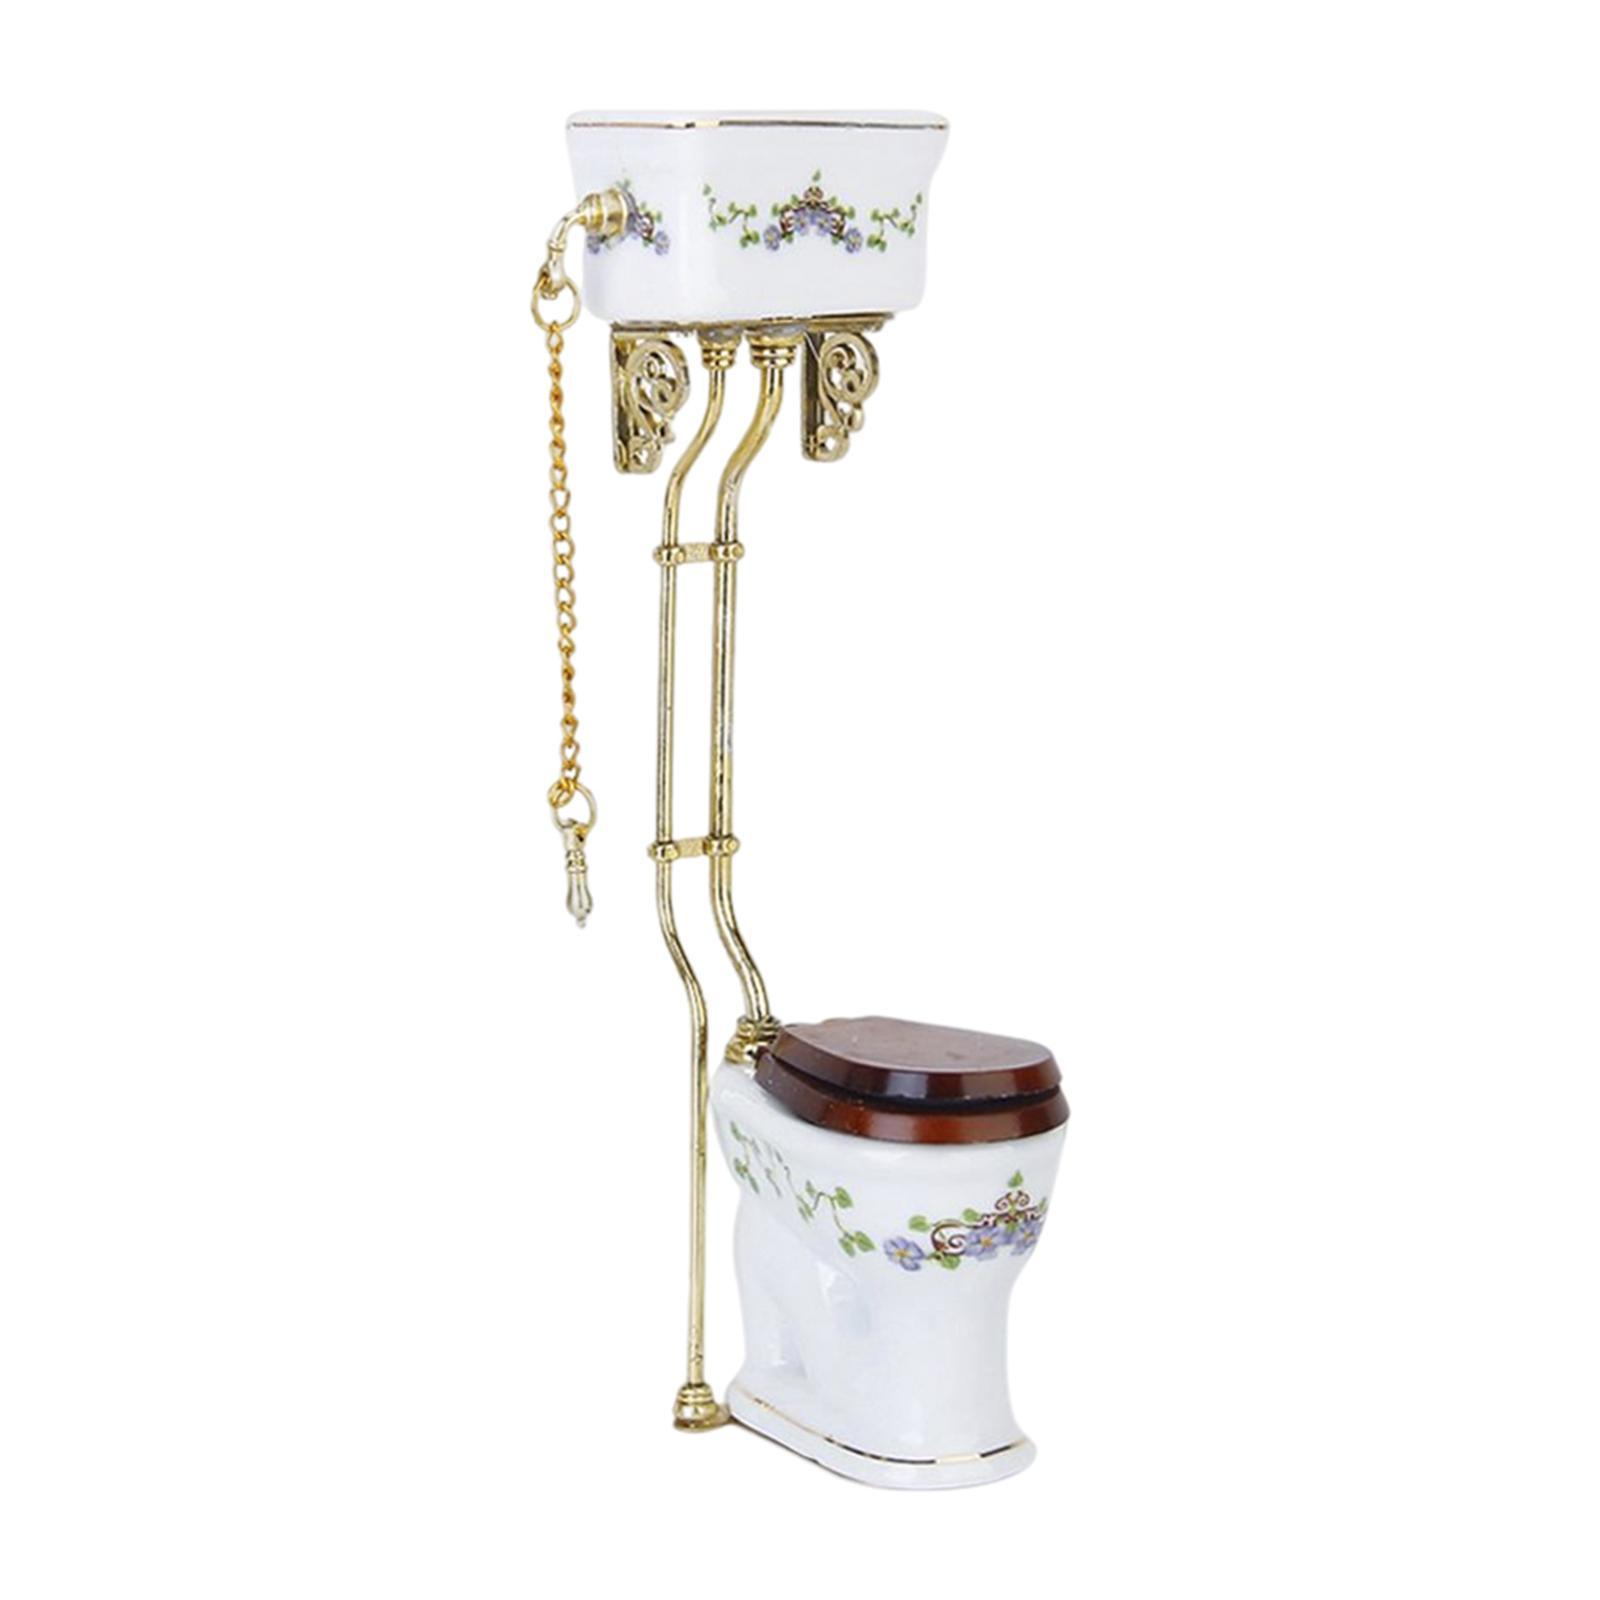 Vintage Victorian Style Bathroom Porcelain Toilet Dollhouse Miniature Accs